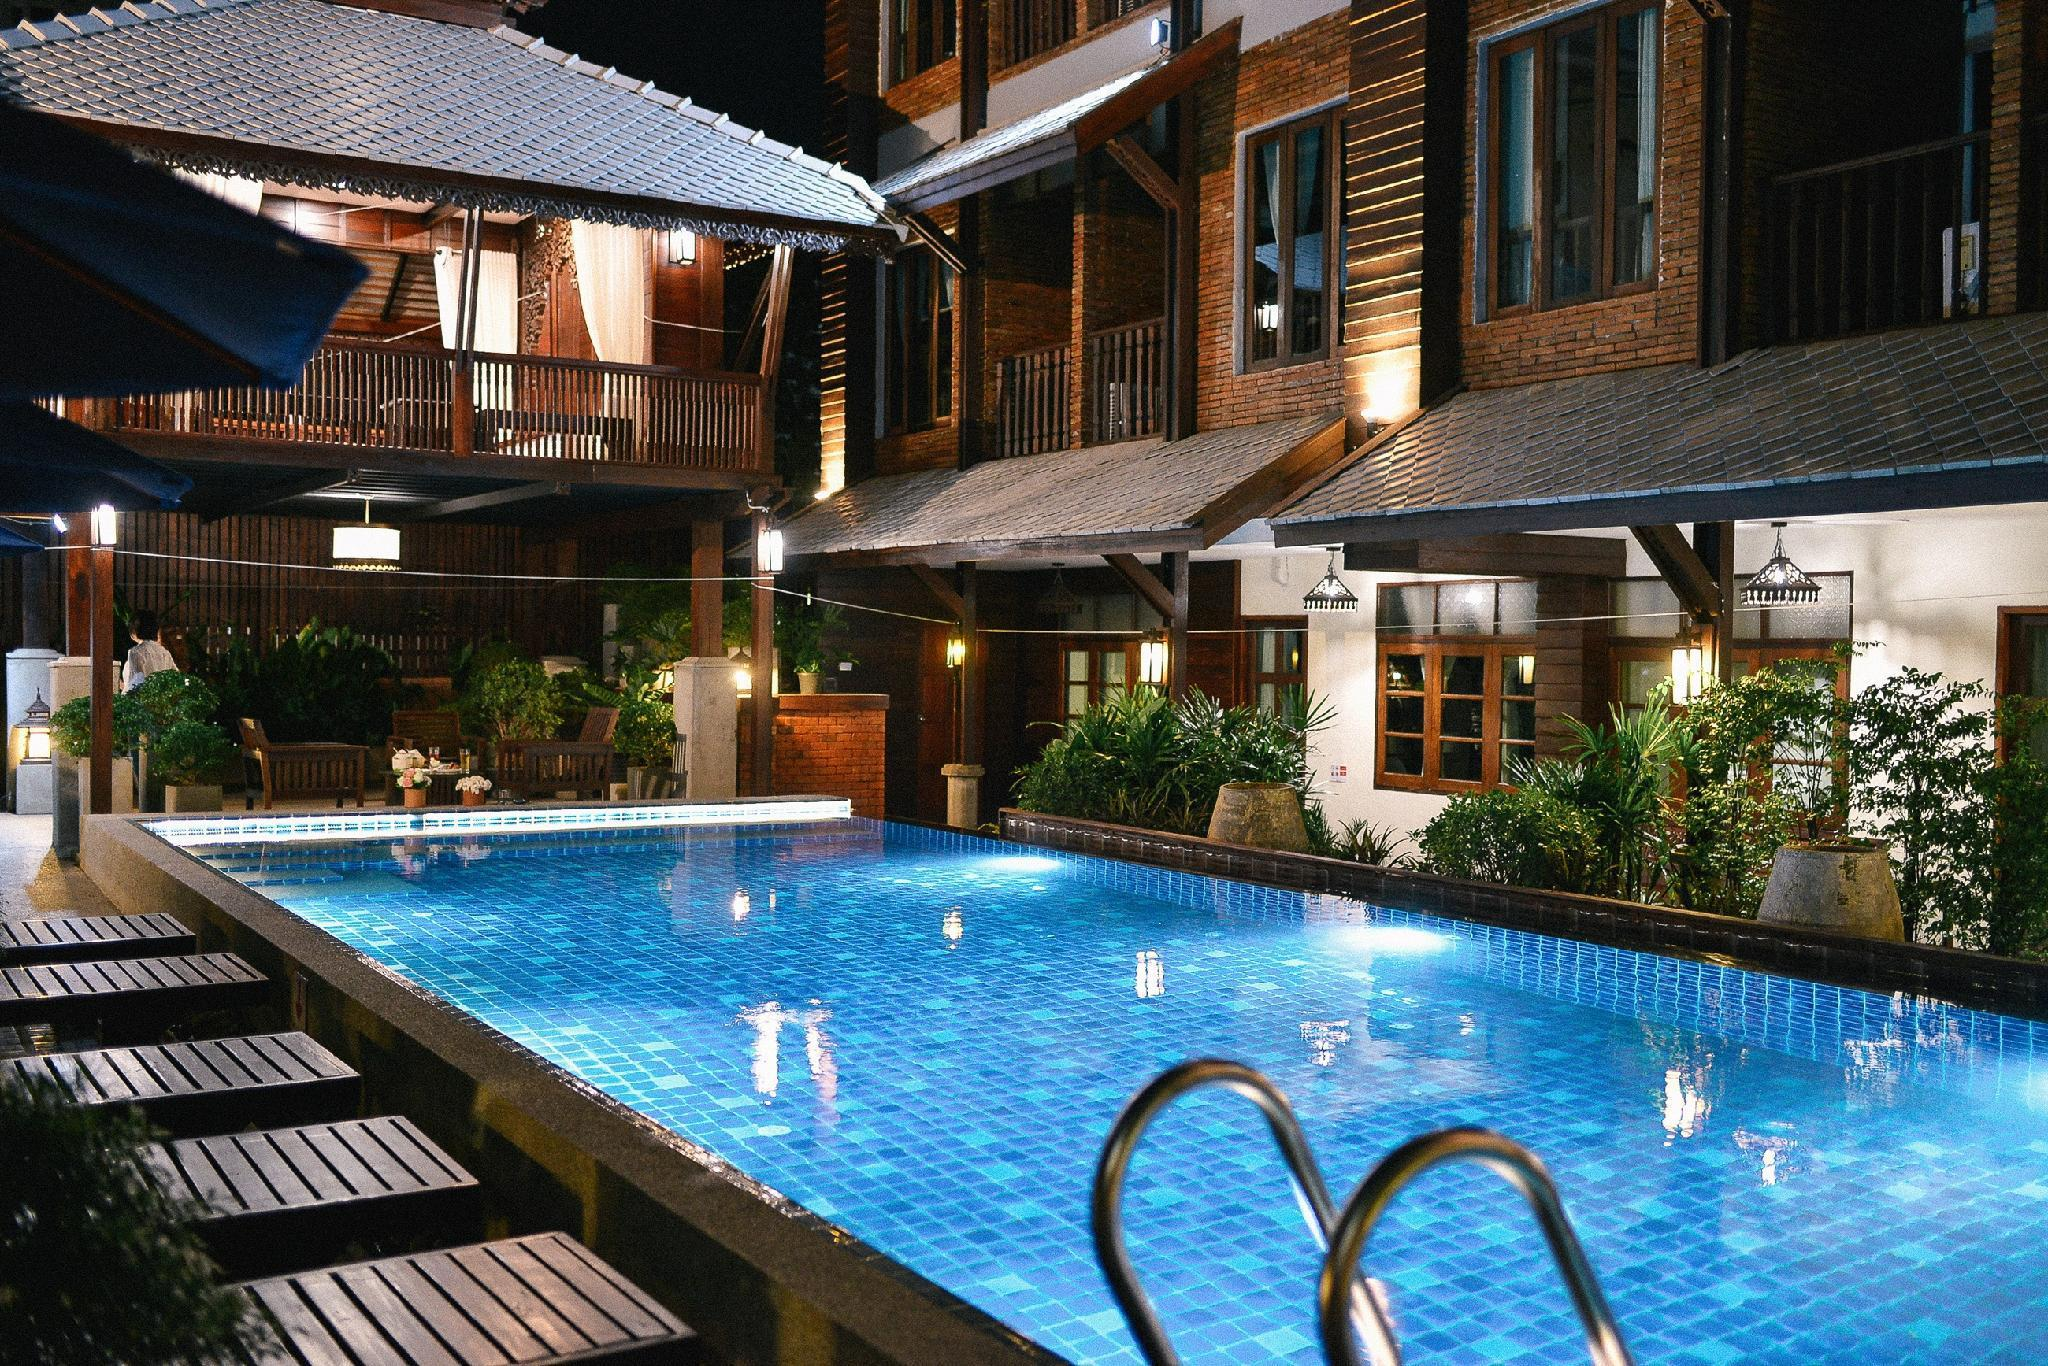 Sunny V Hotel โรงแรมซันนี วี